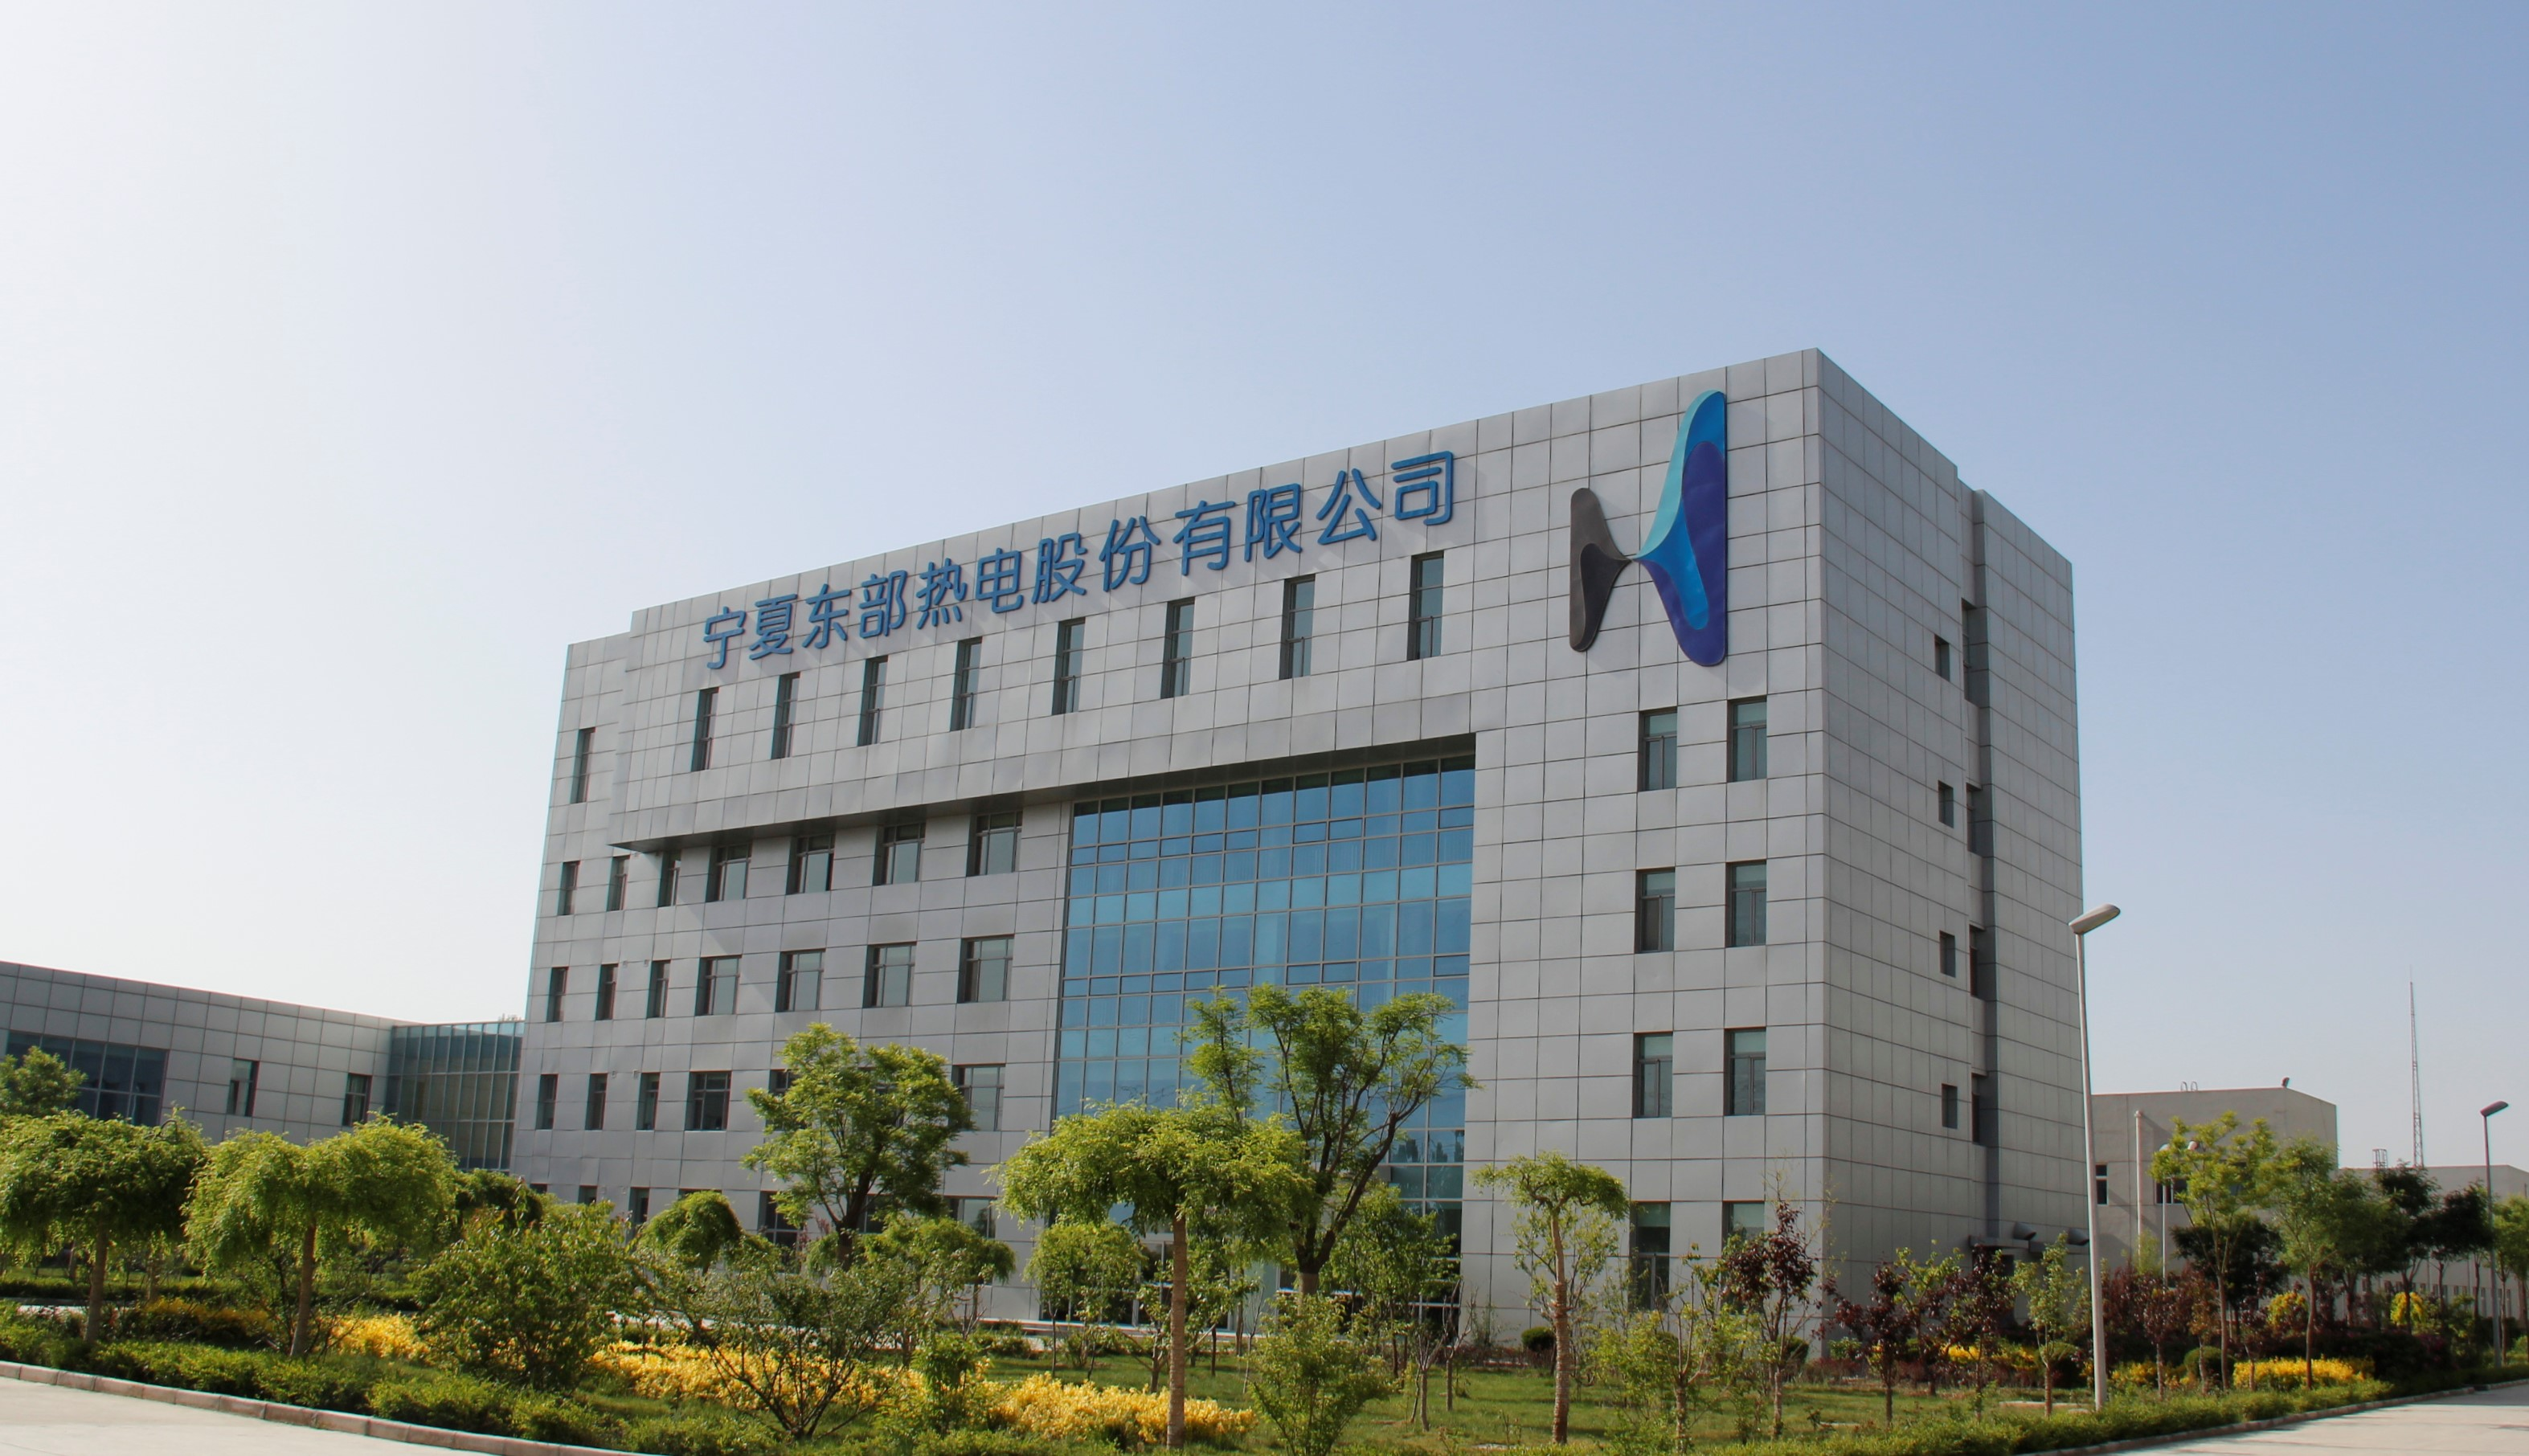 Ningxia East Thermal Power Plant Hanas Group